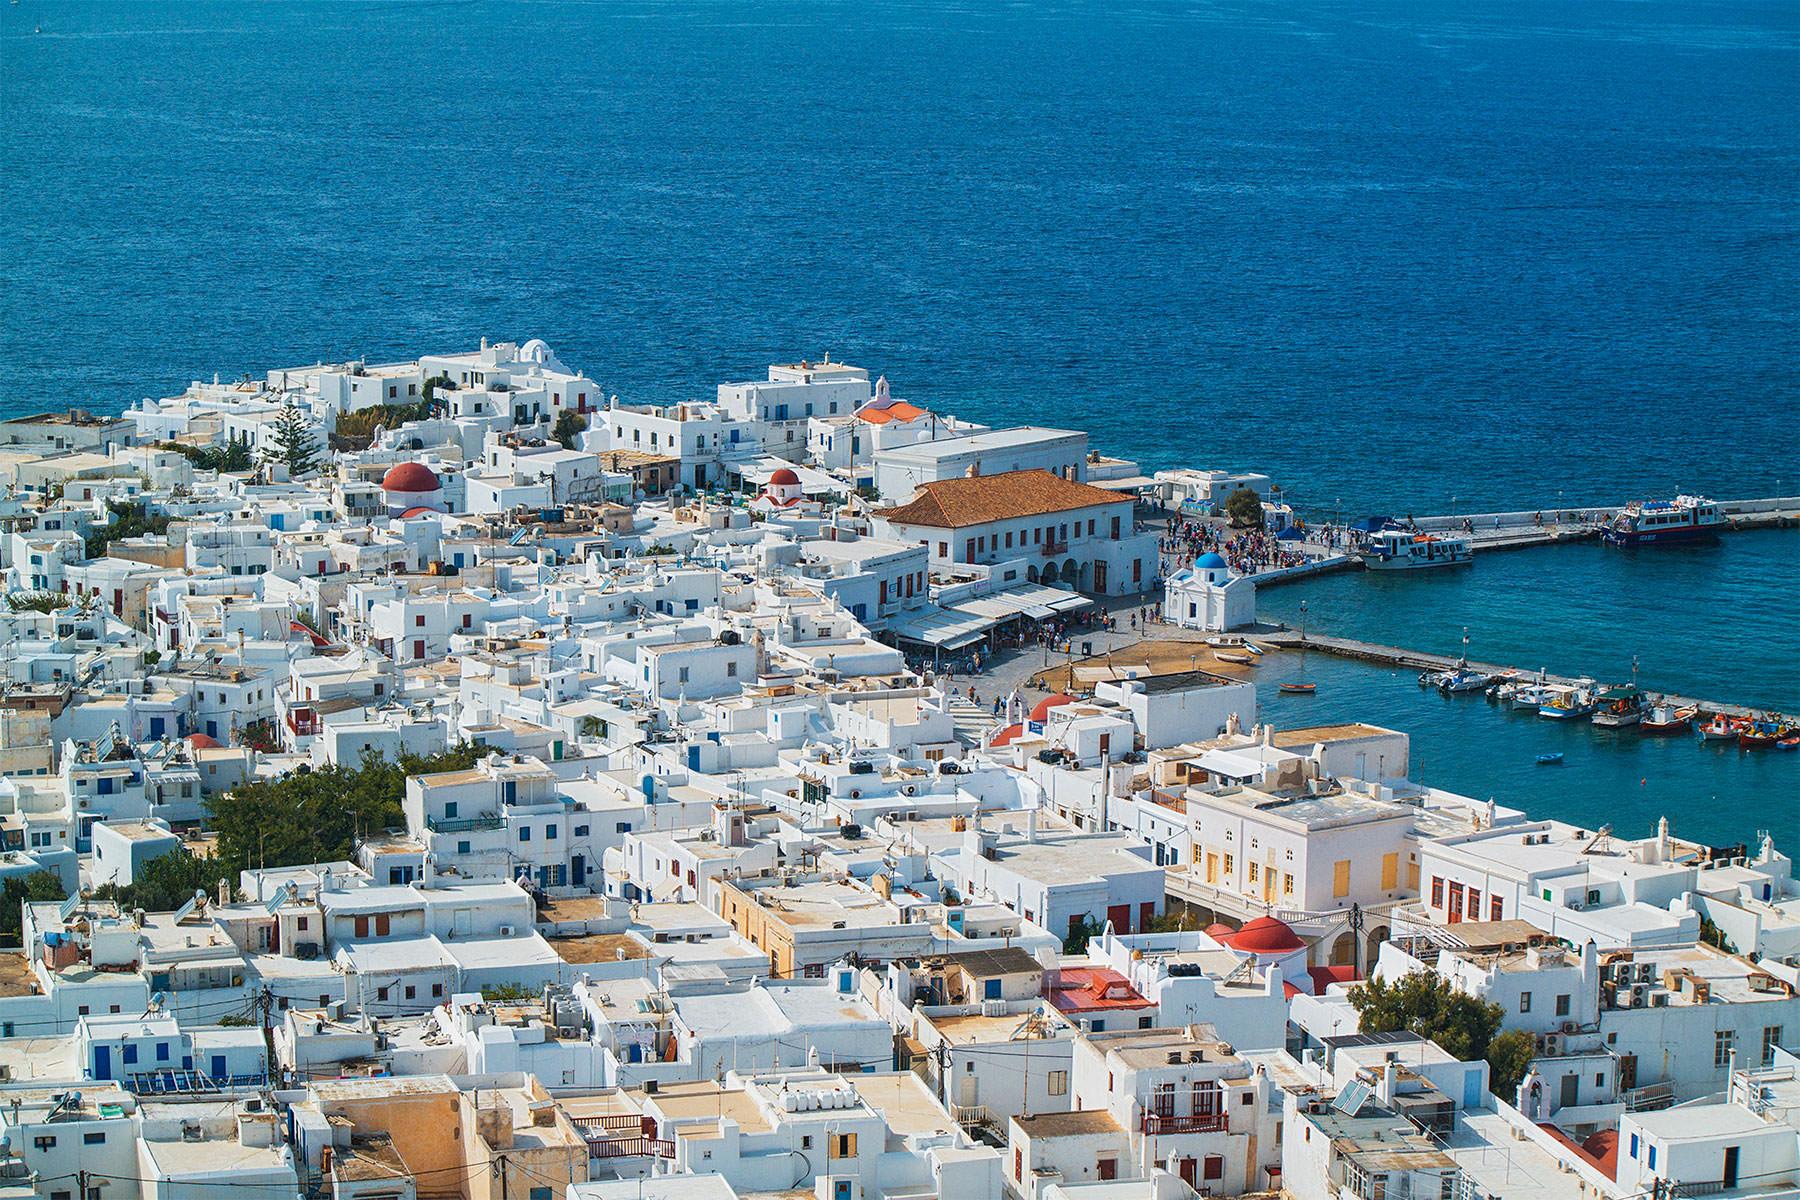 Hermes Mykonos | Mykonos Island